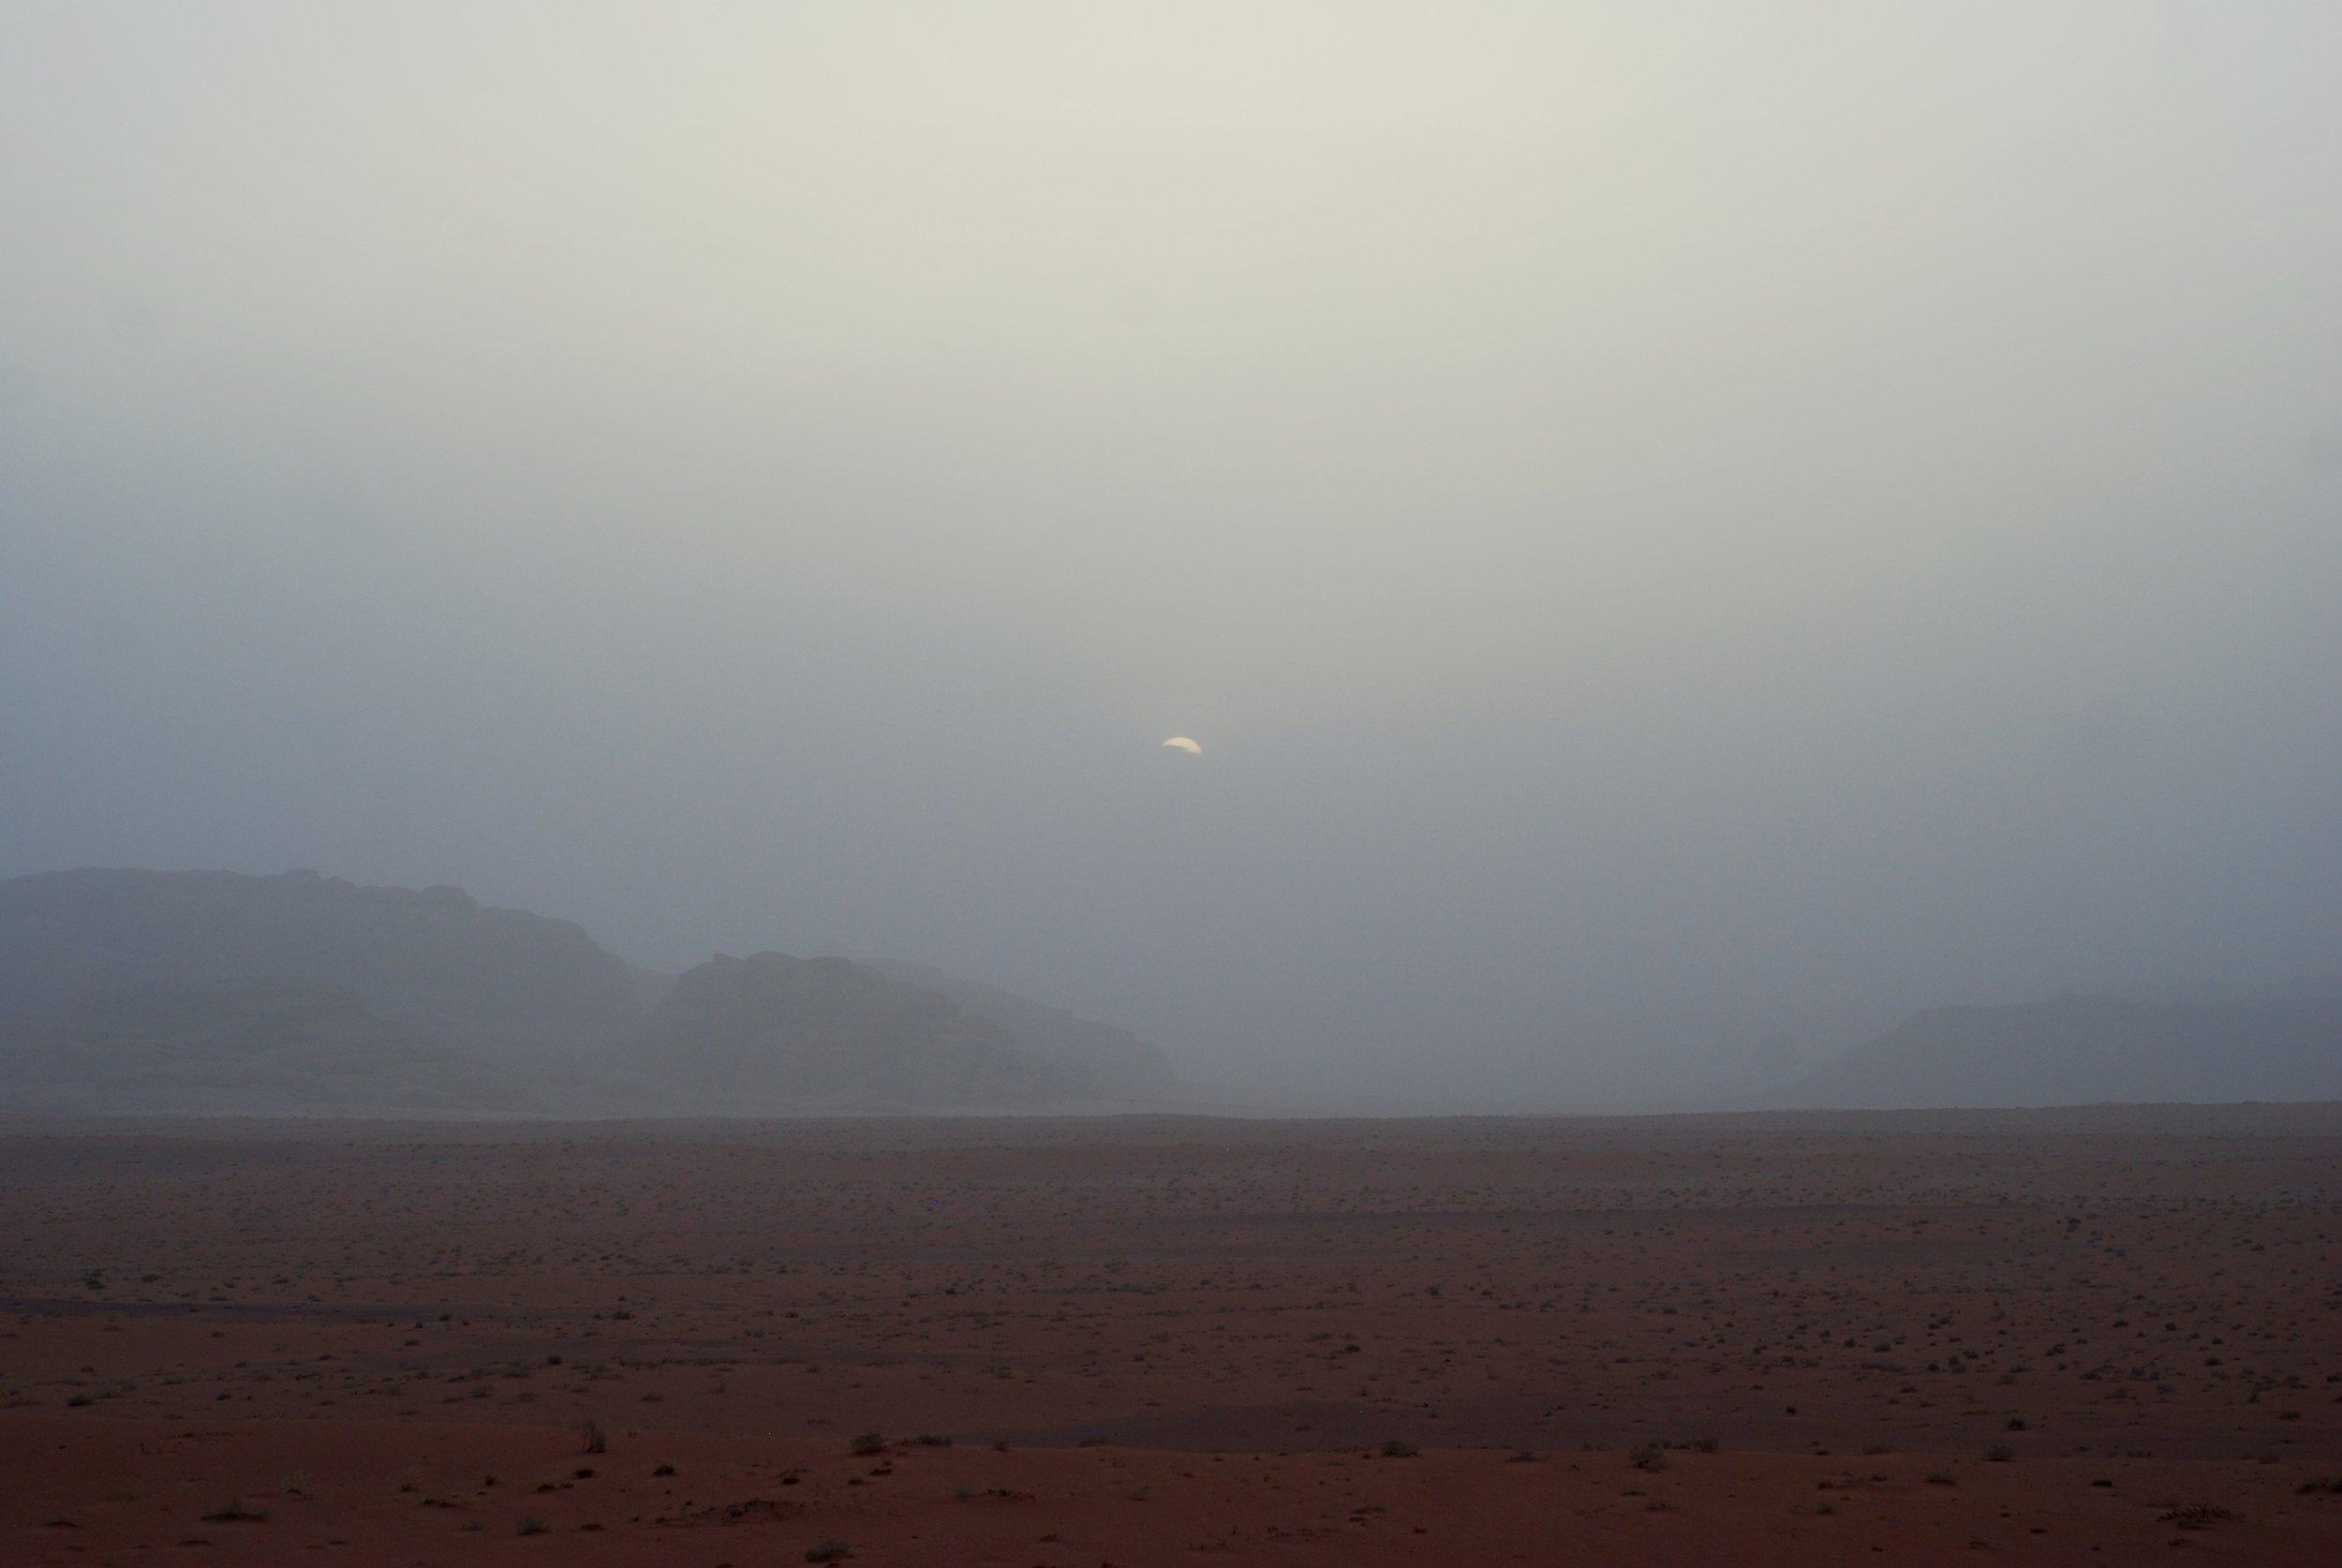 Um Sabatah Filming Location for 'The Martian'